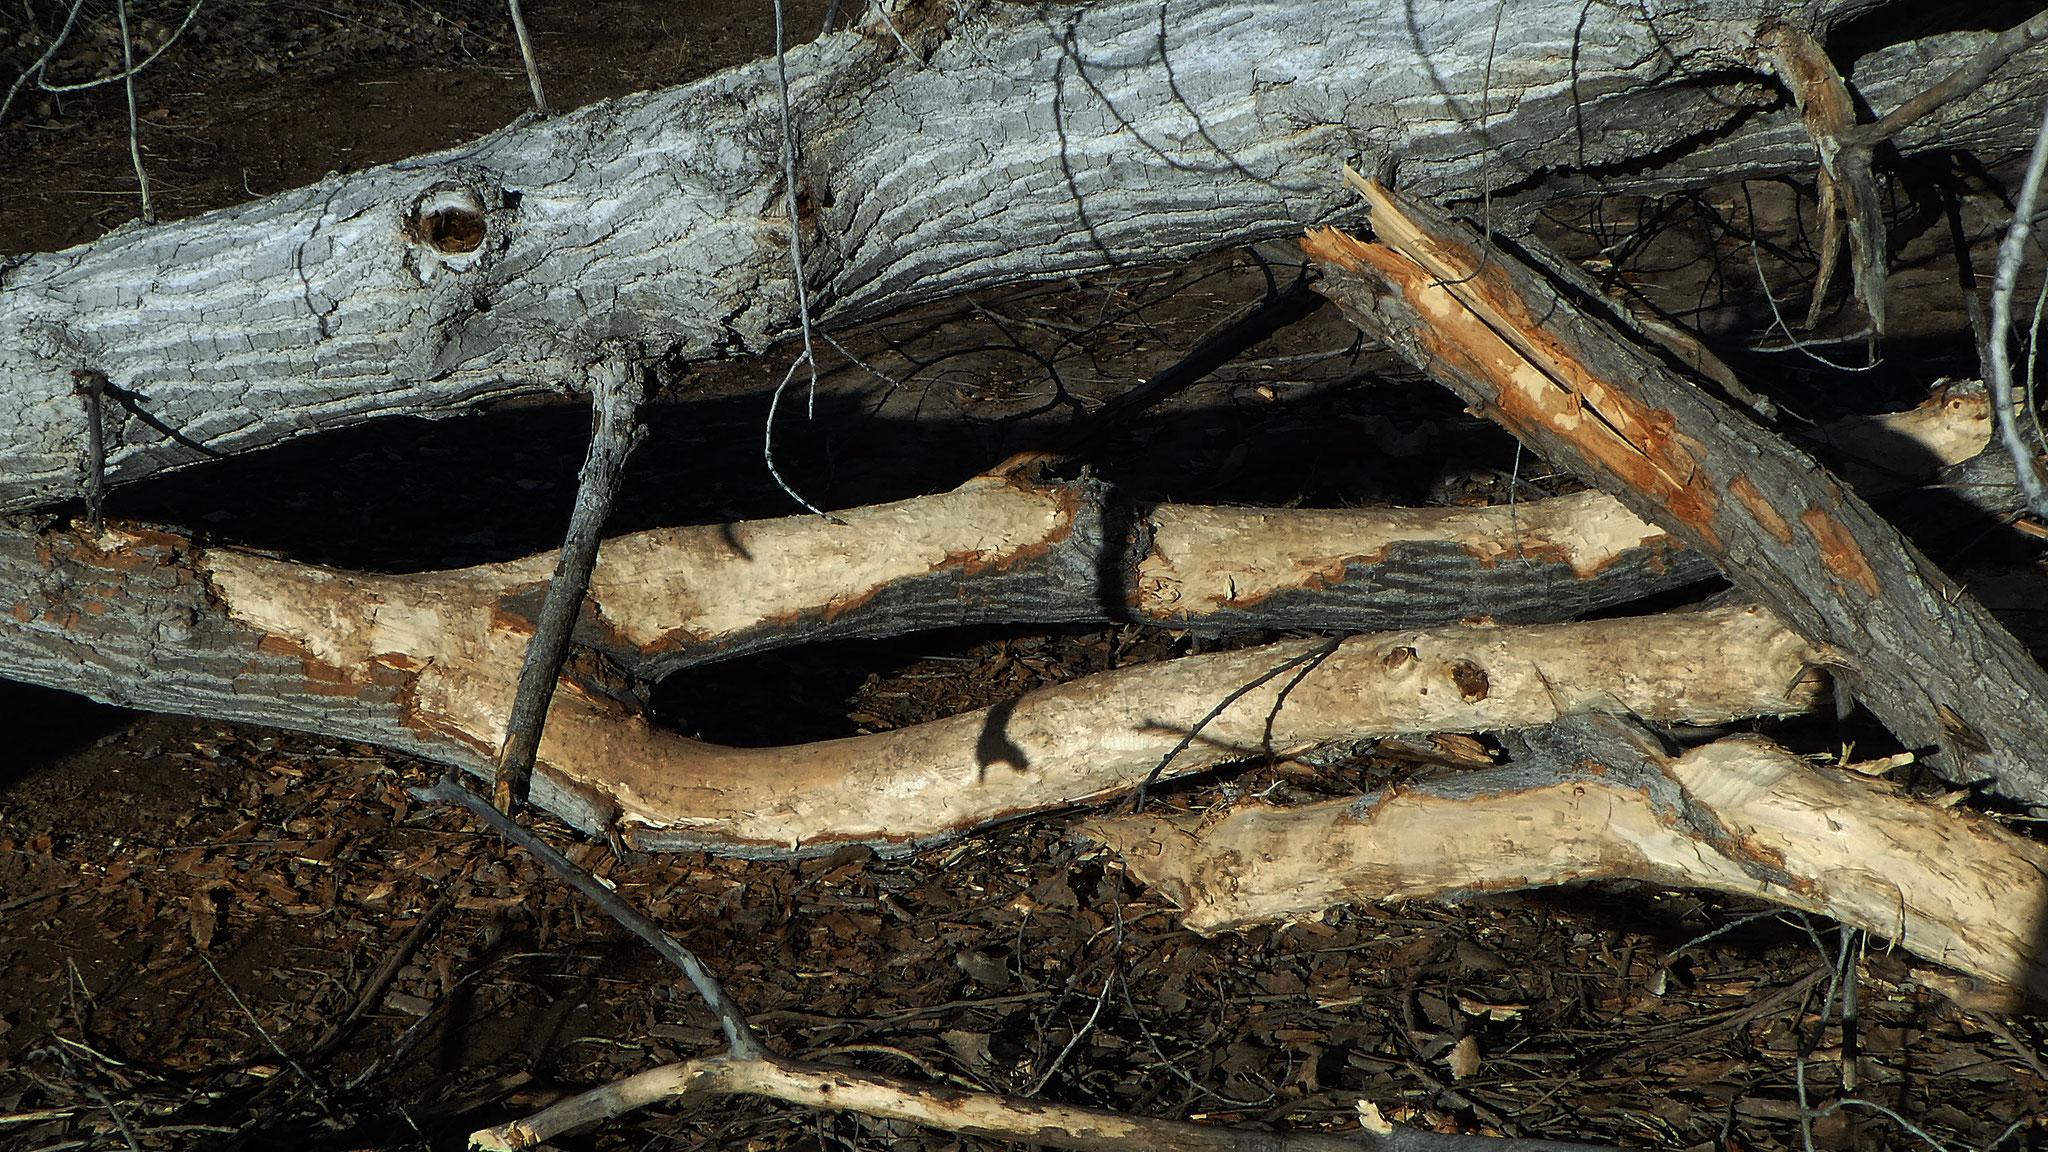 Stripped felled tree, Rio Grande Bosque, Corrales, January 2019